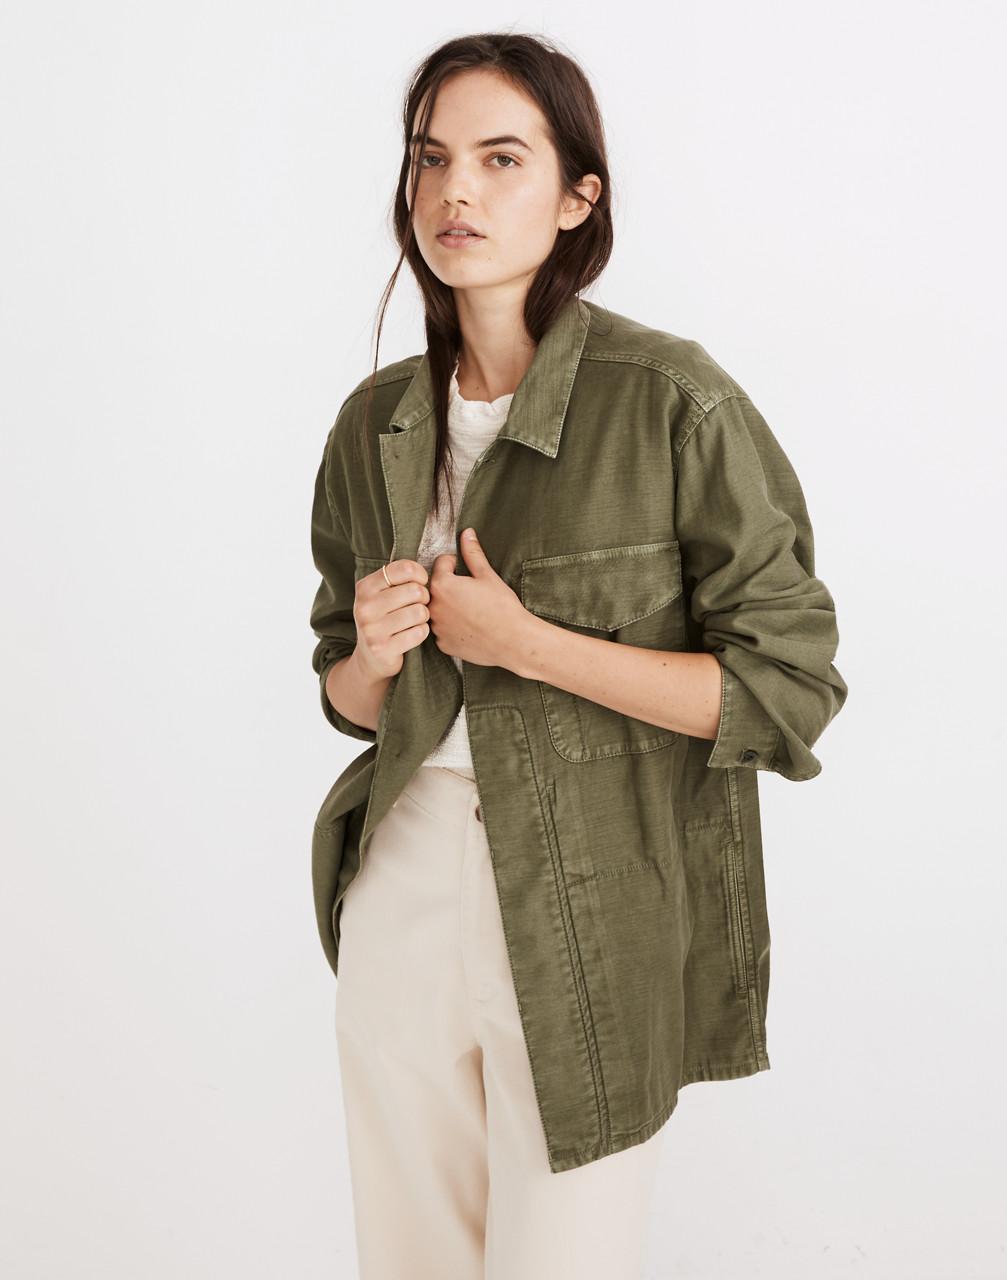 80s Windbreakers, Jackets, Coats Military Shirt Jacket $138.00 AT vintagedancer.com